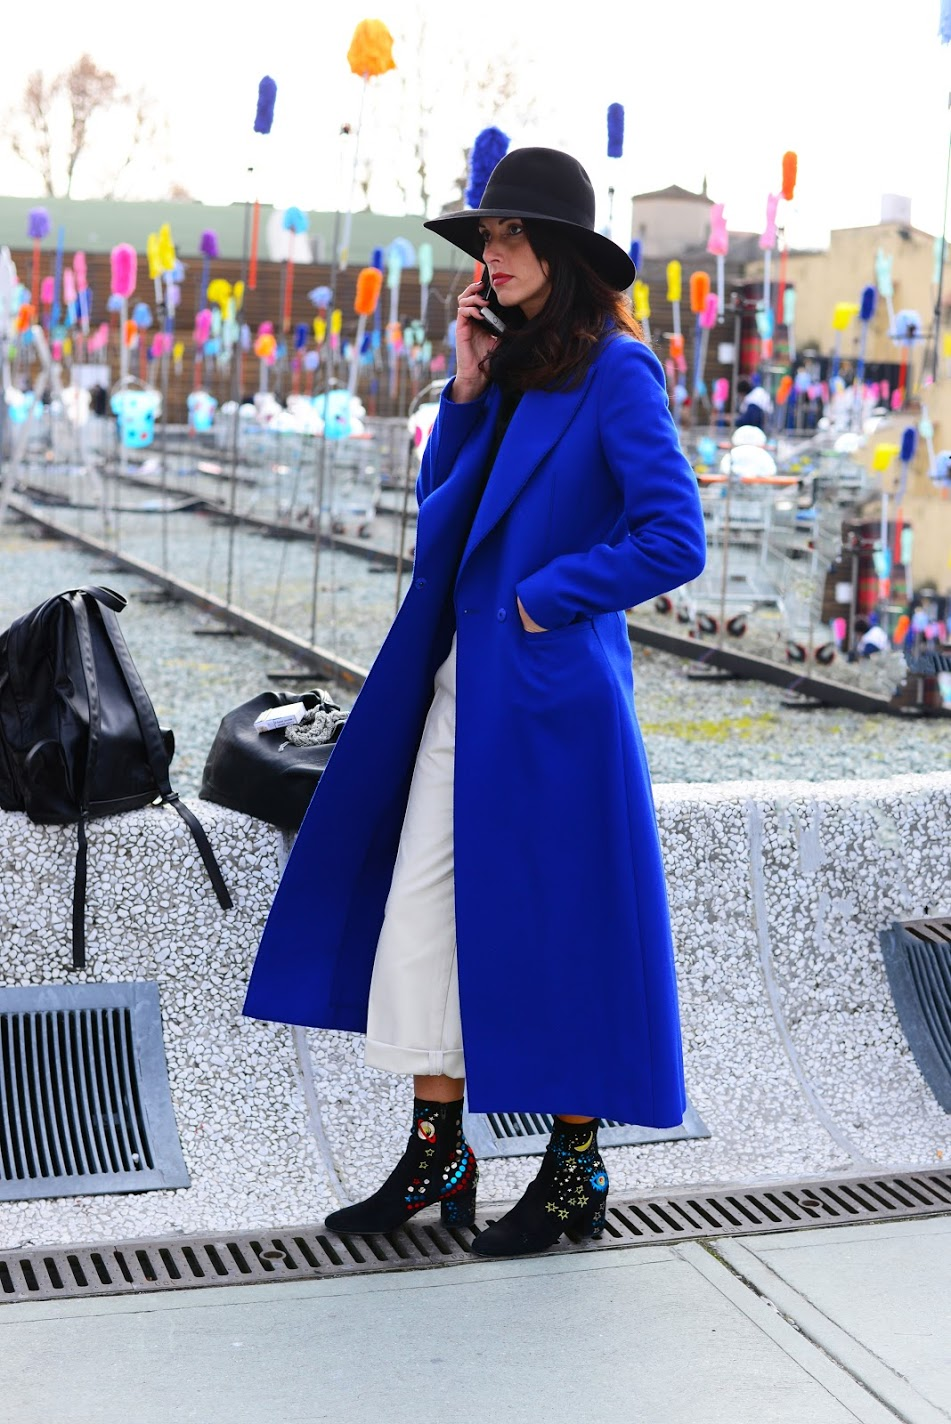 37 street style shots from pitti uomo 91 sidewalk hustle